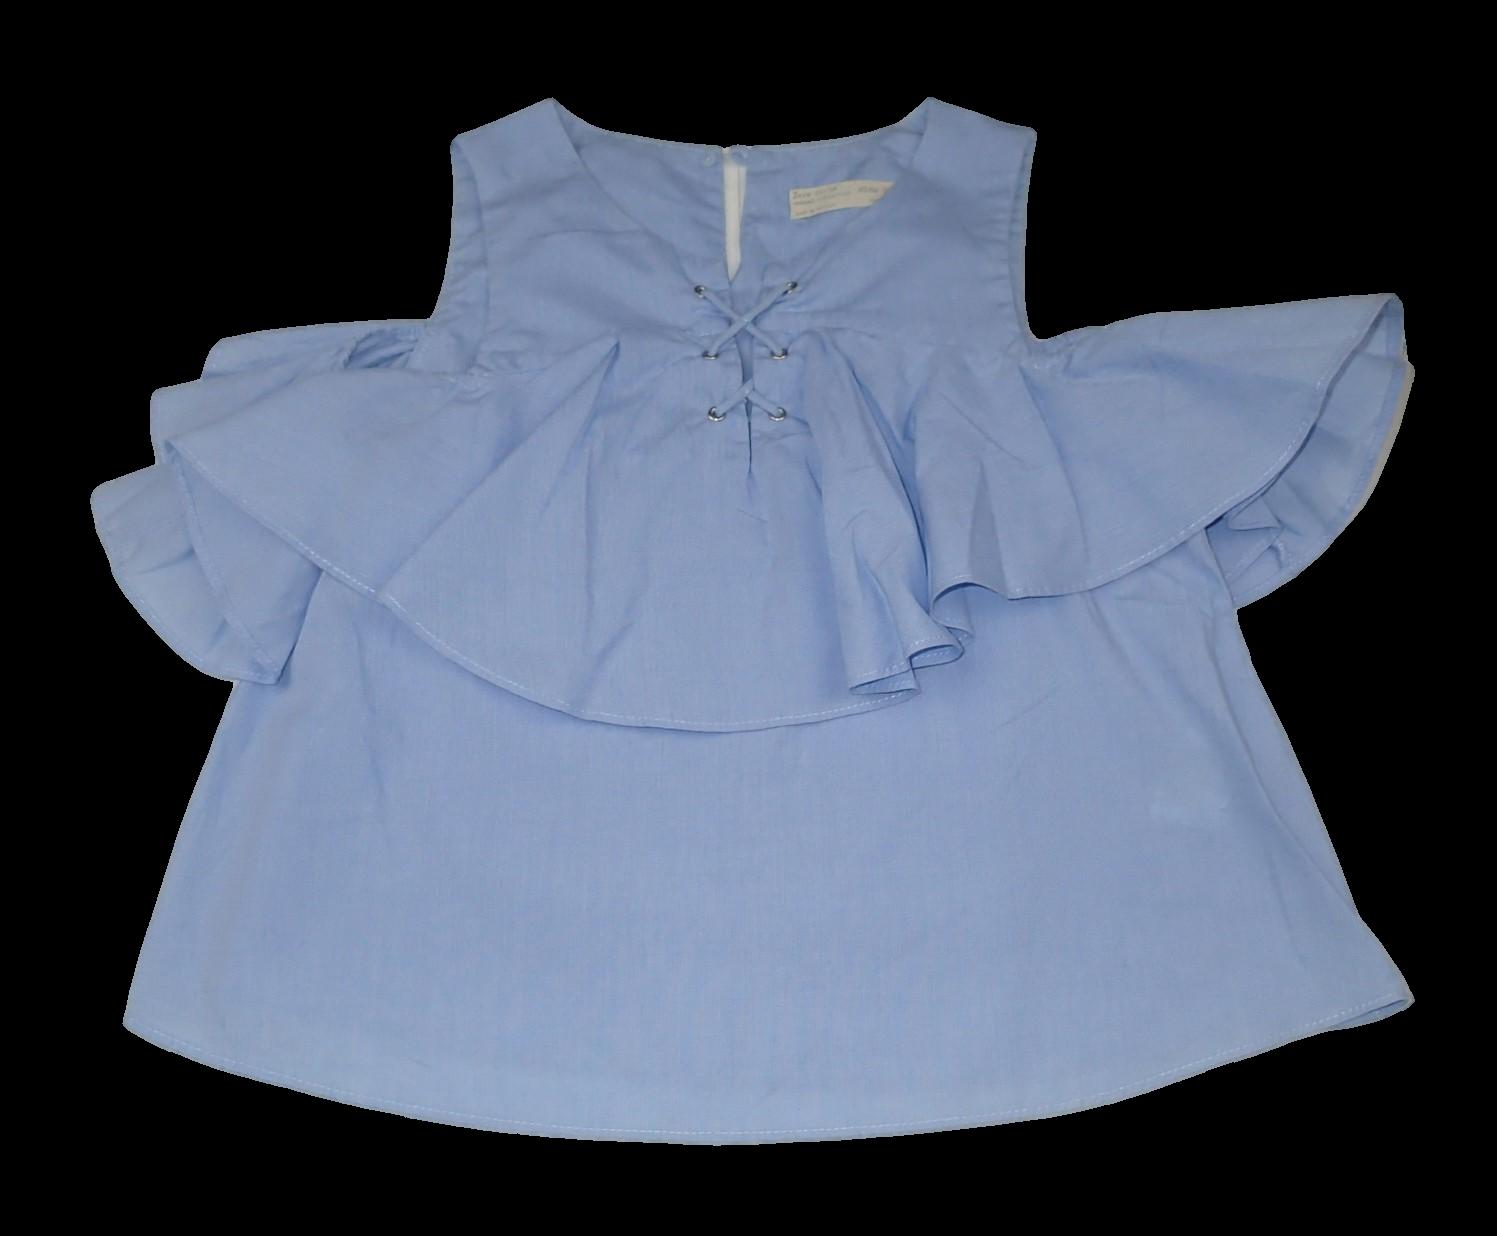 Zara - Taille 9-10 ans